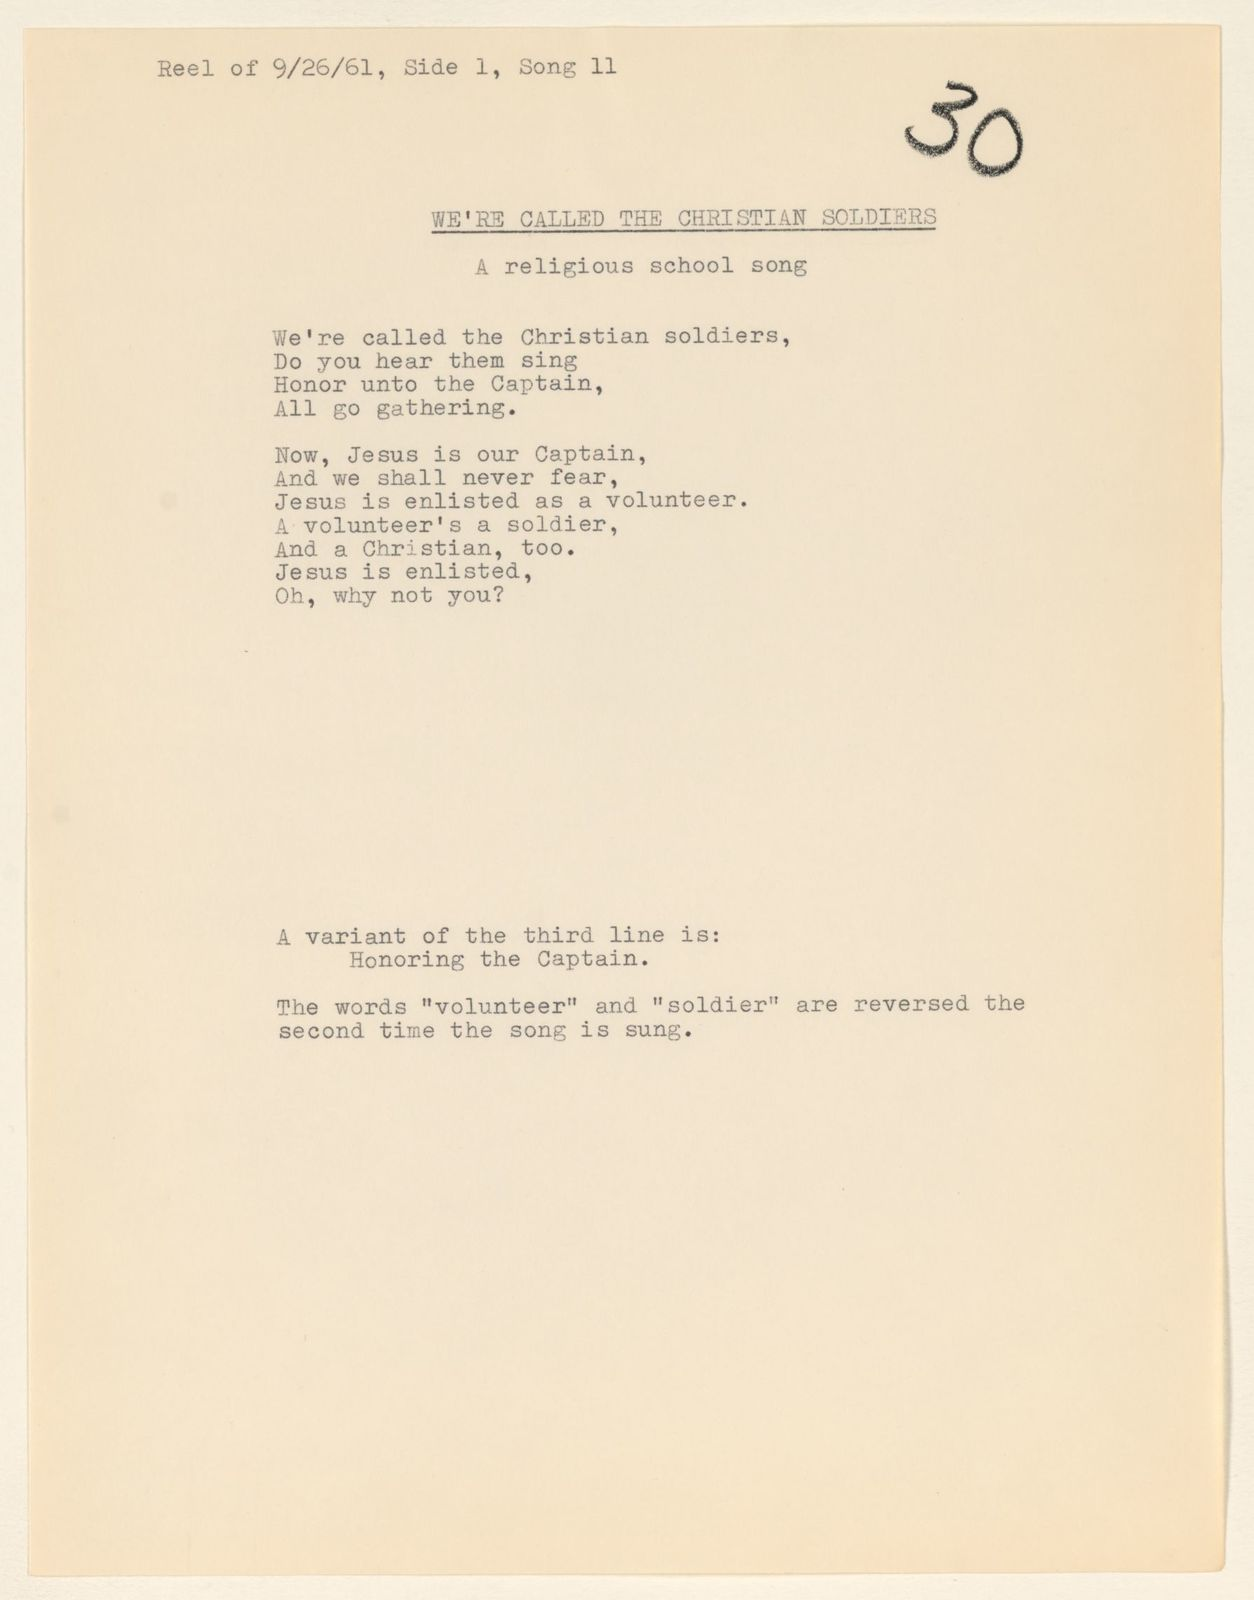 Alan Lomax Collection, Manuscripts, New York City, 1961-1962